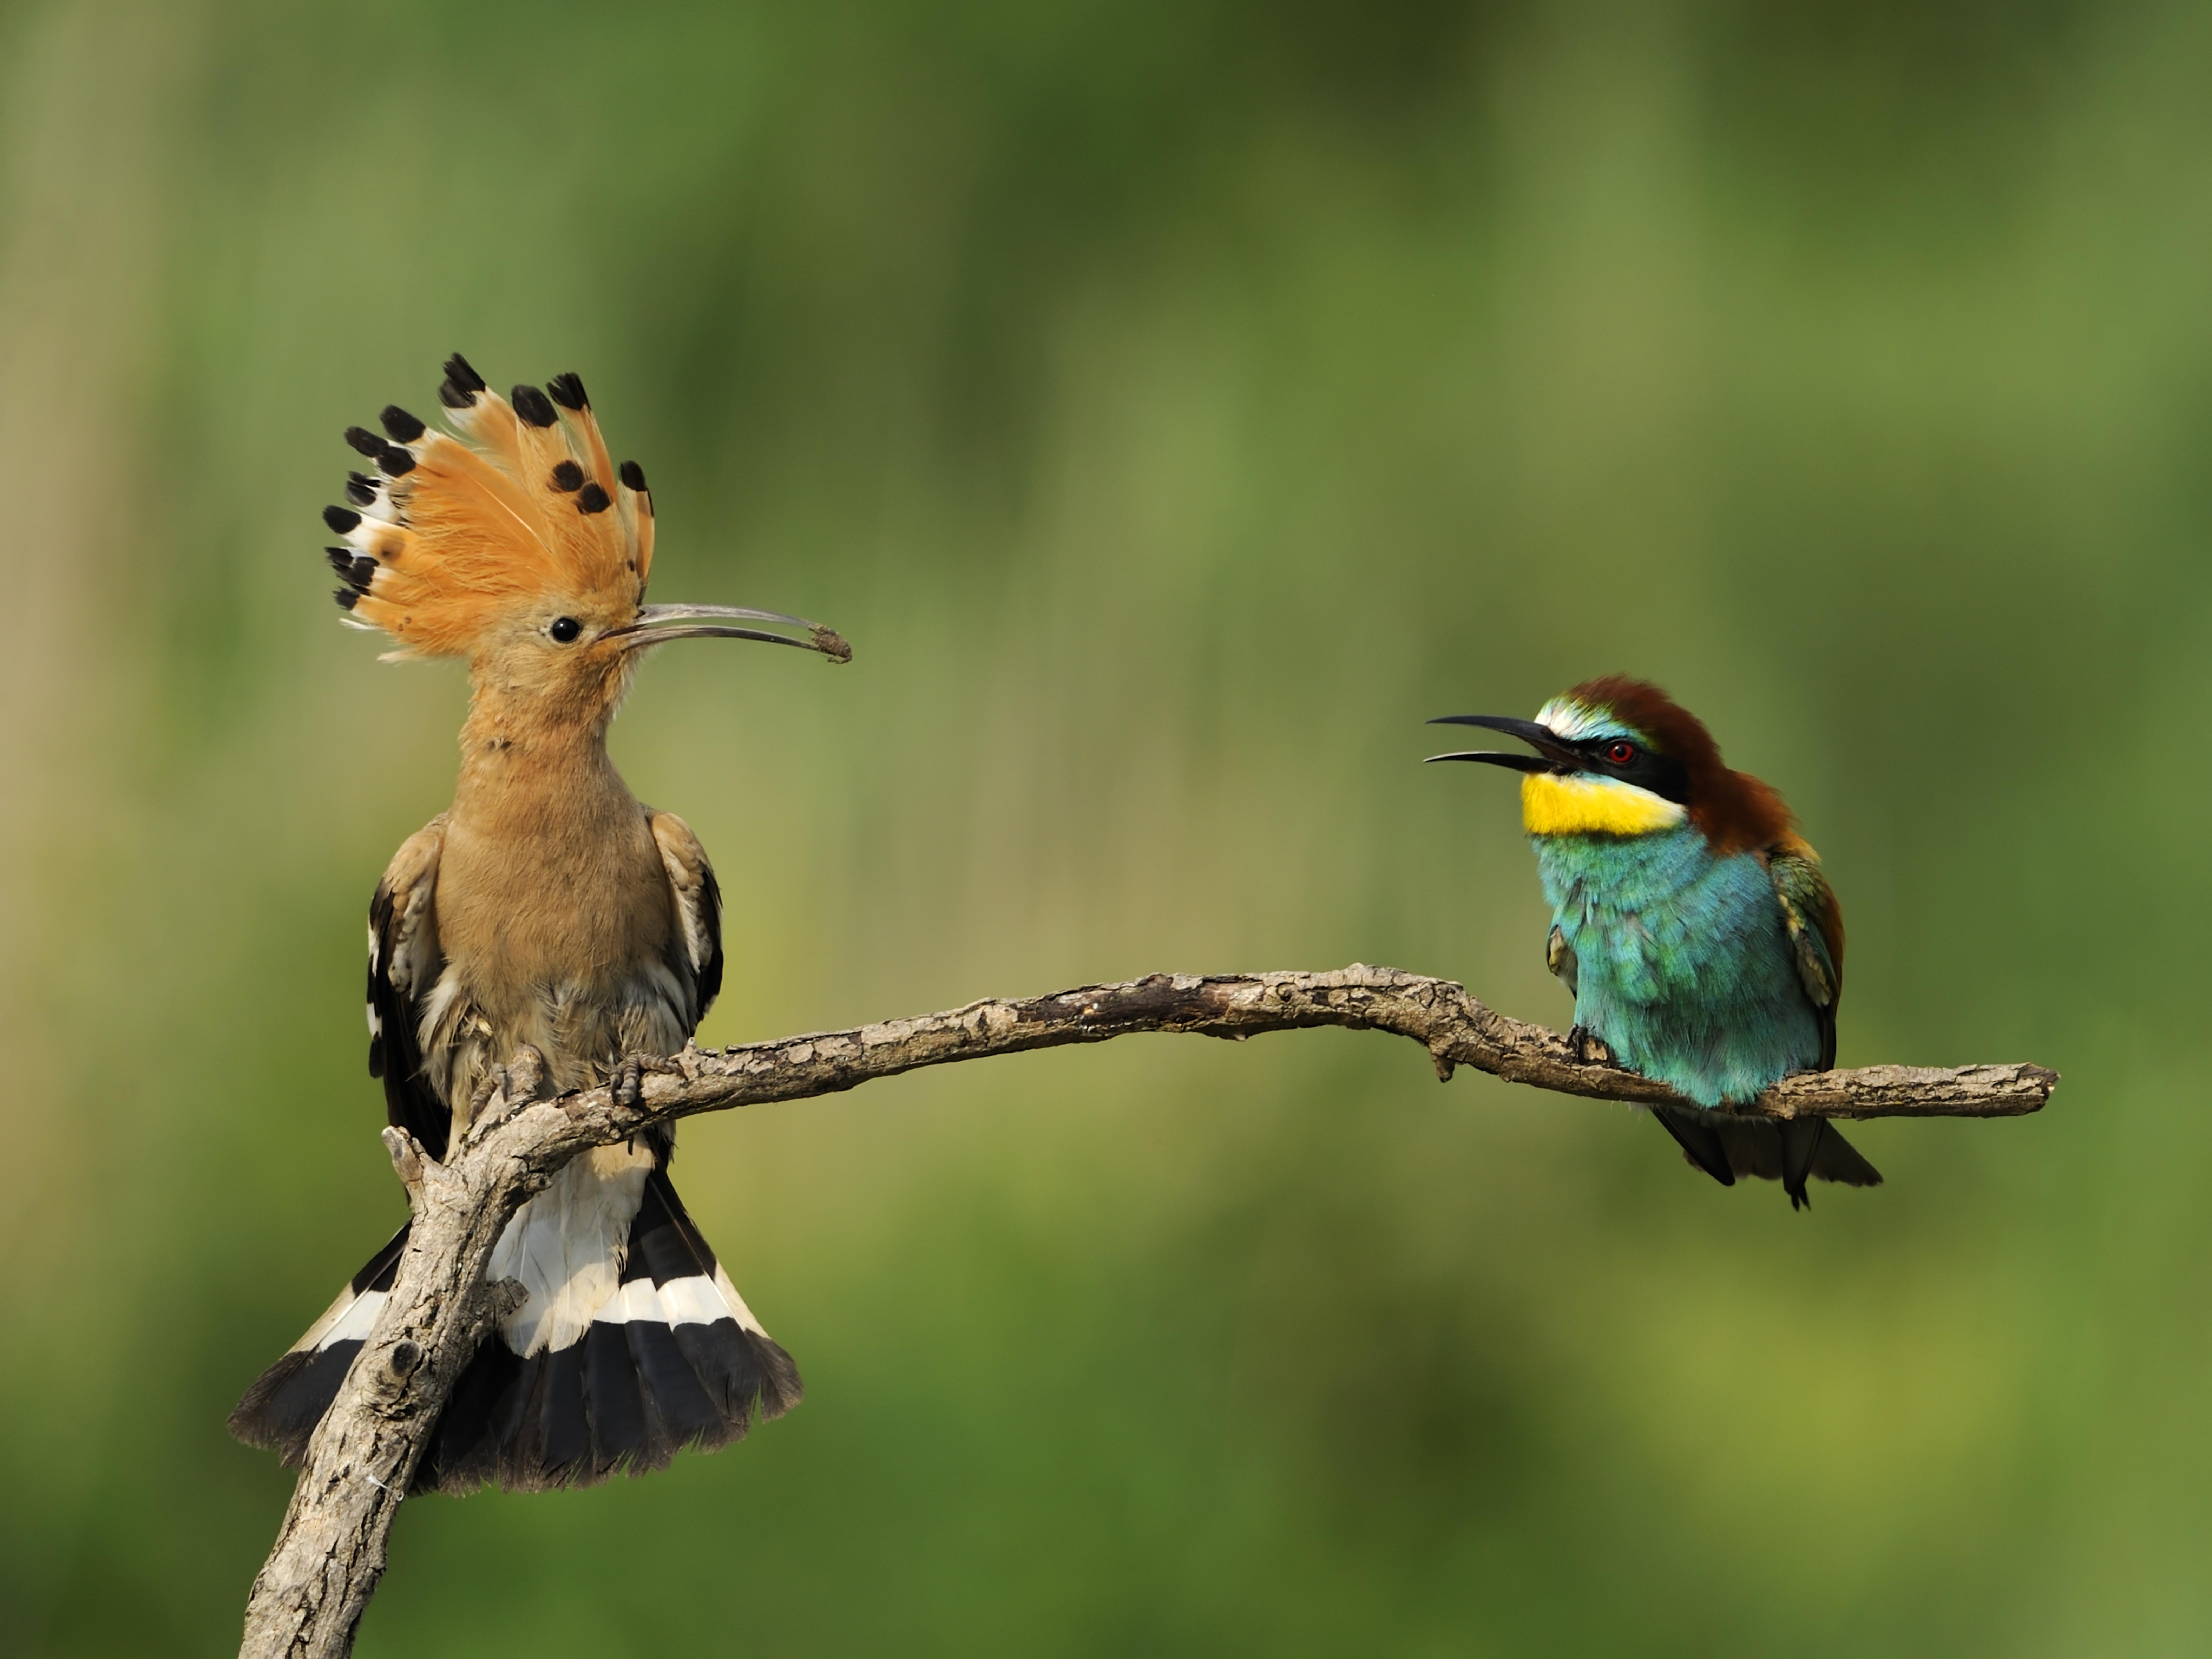 Abubilla y abejaruco. ©Shutterstock